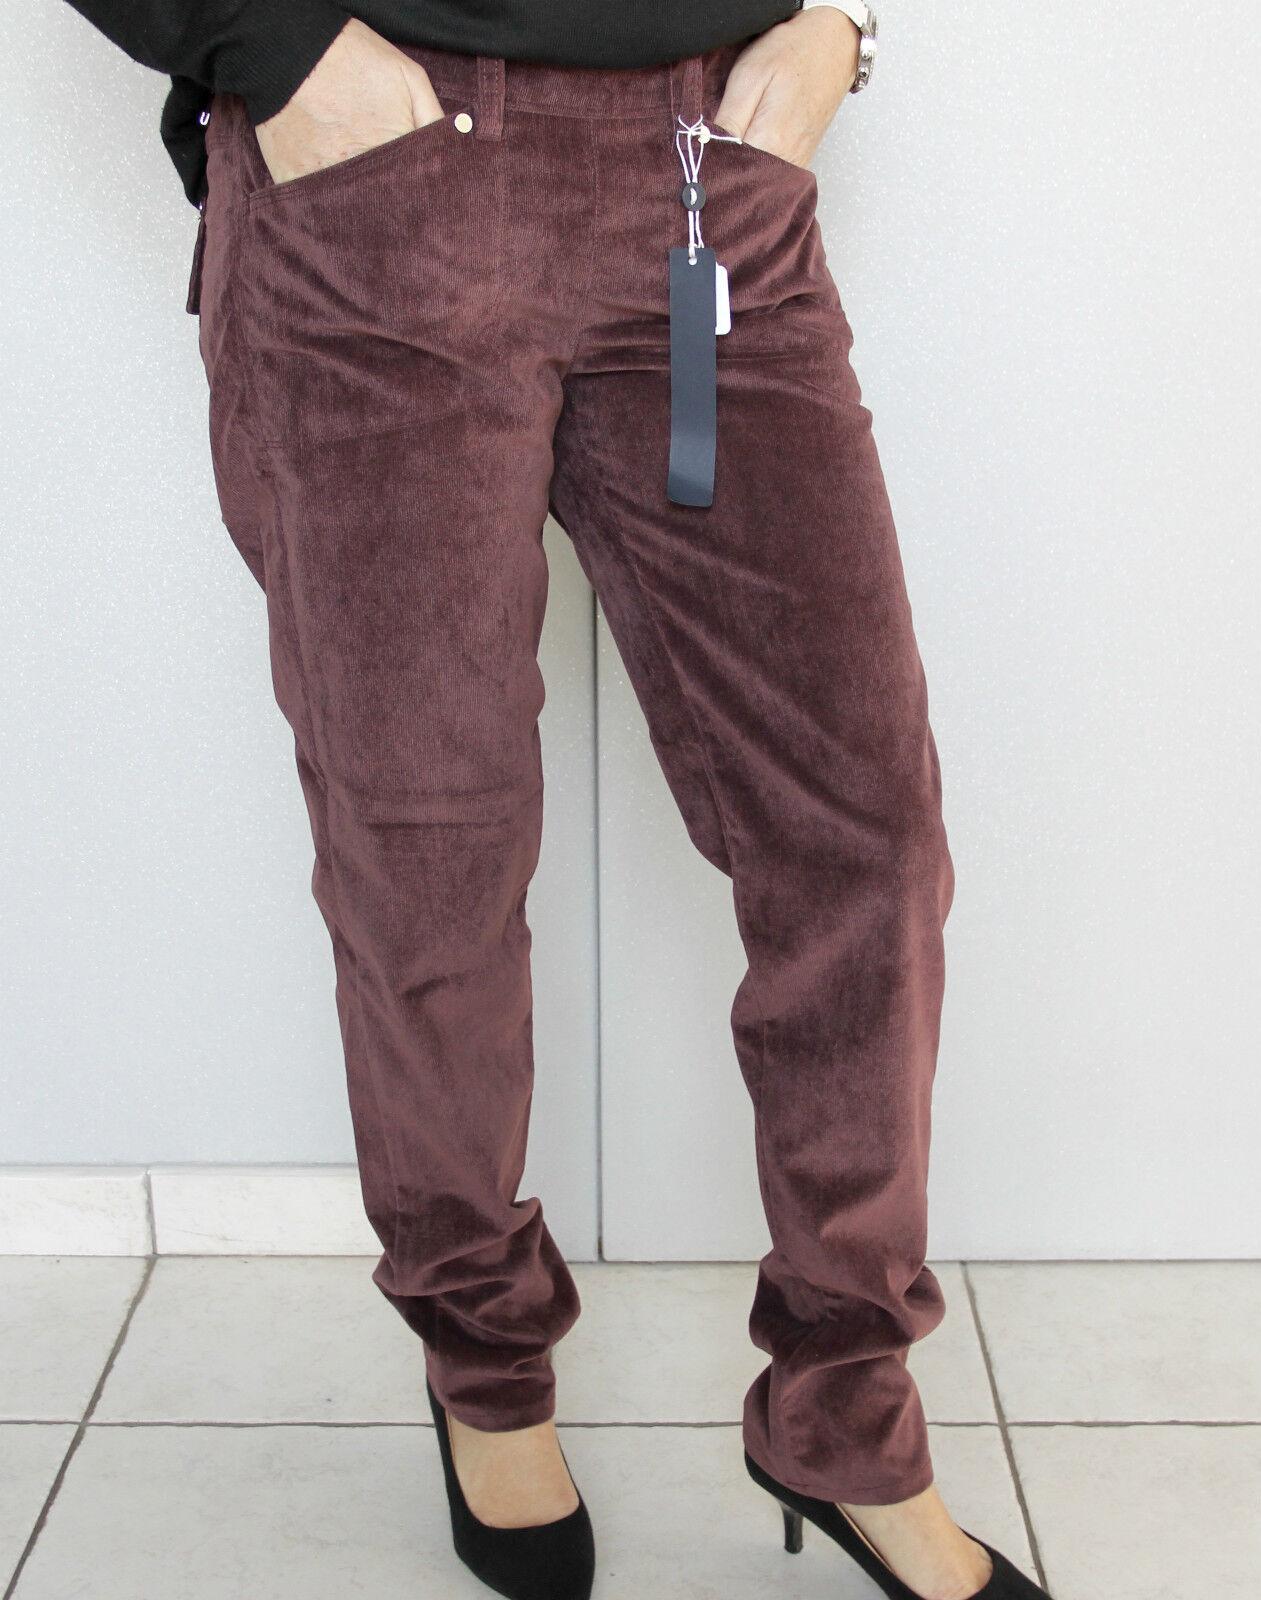 Pantalon velours ras bordeaux HIGH USE T 38 40 (I 42) NEUF ÉTIQUETTE val.